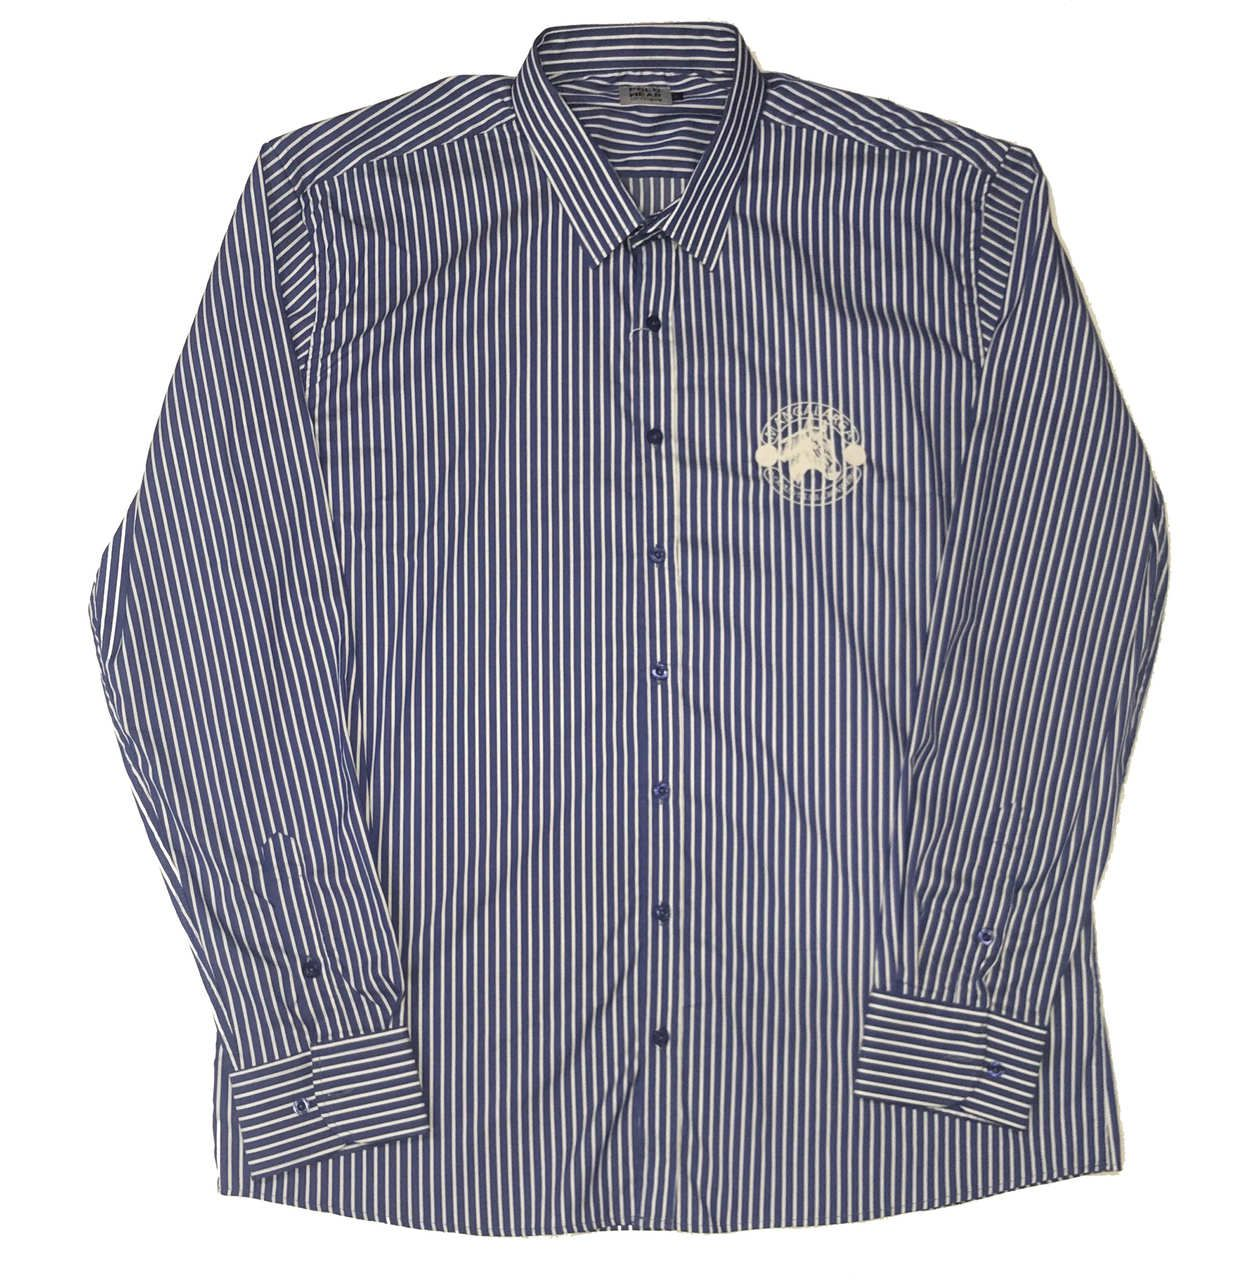 Camisa Top Premium Masculina Listras Azul  - Boutique Mangalarga